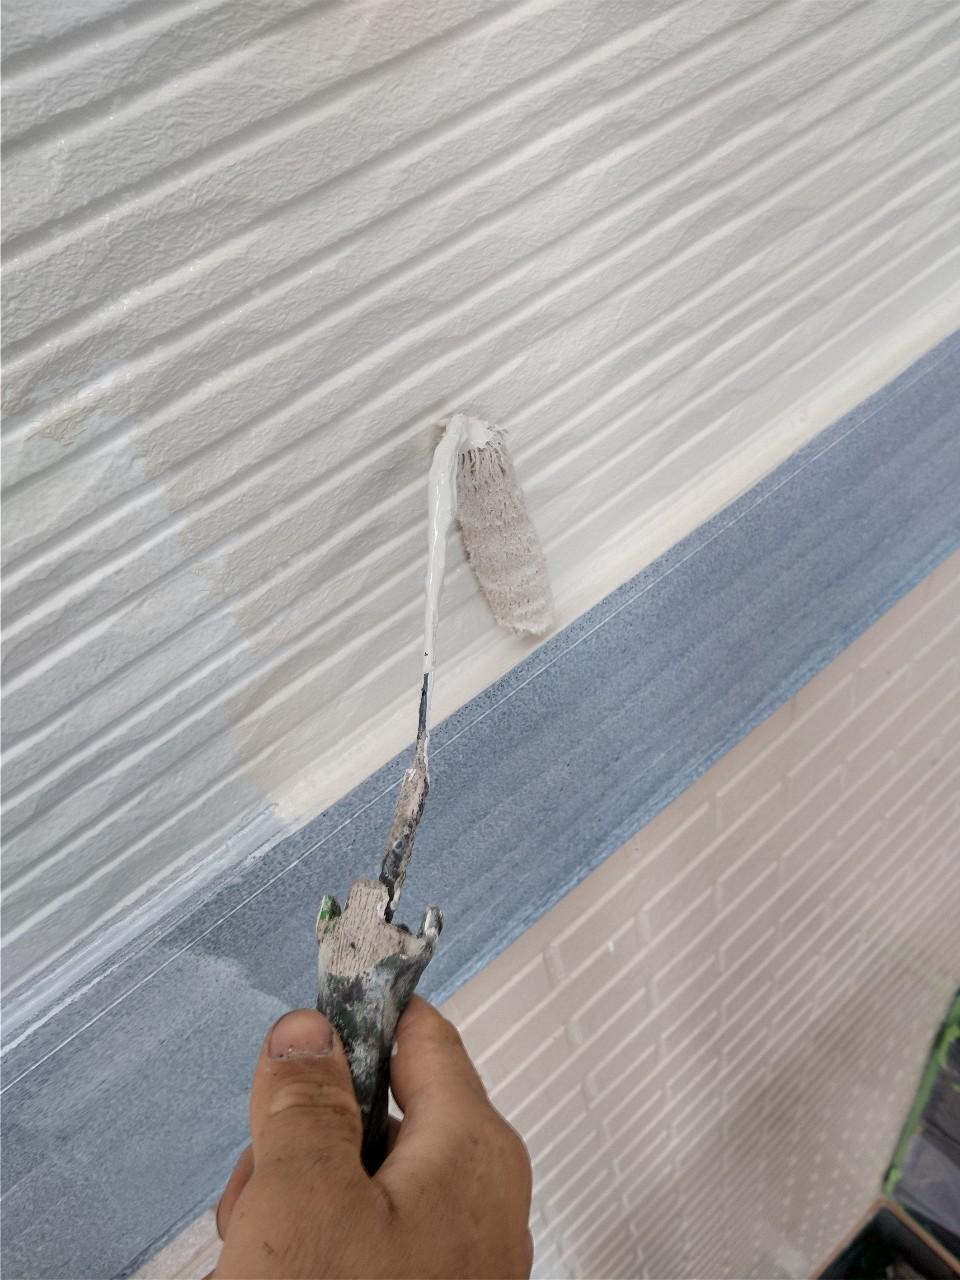 伊奈町賃貸一軒家外壁塗装の下塗り